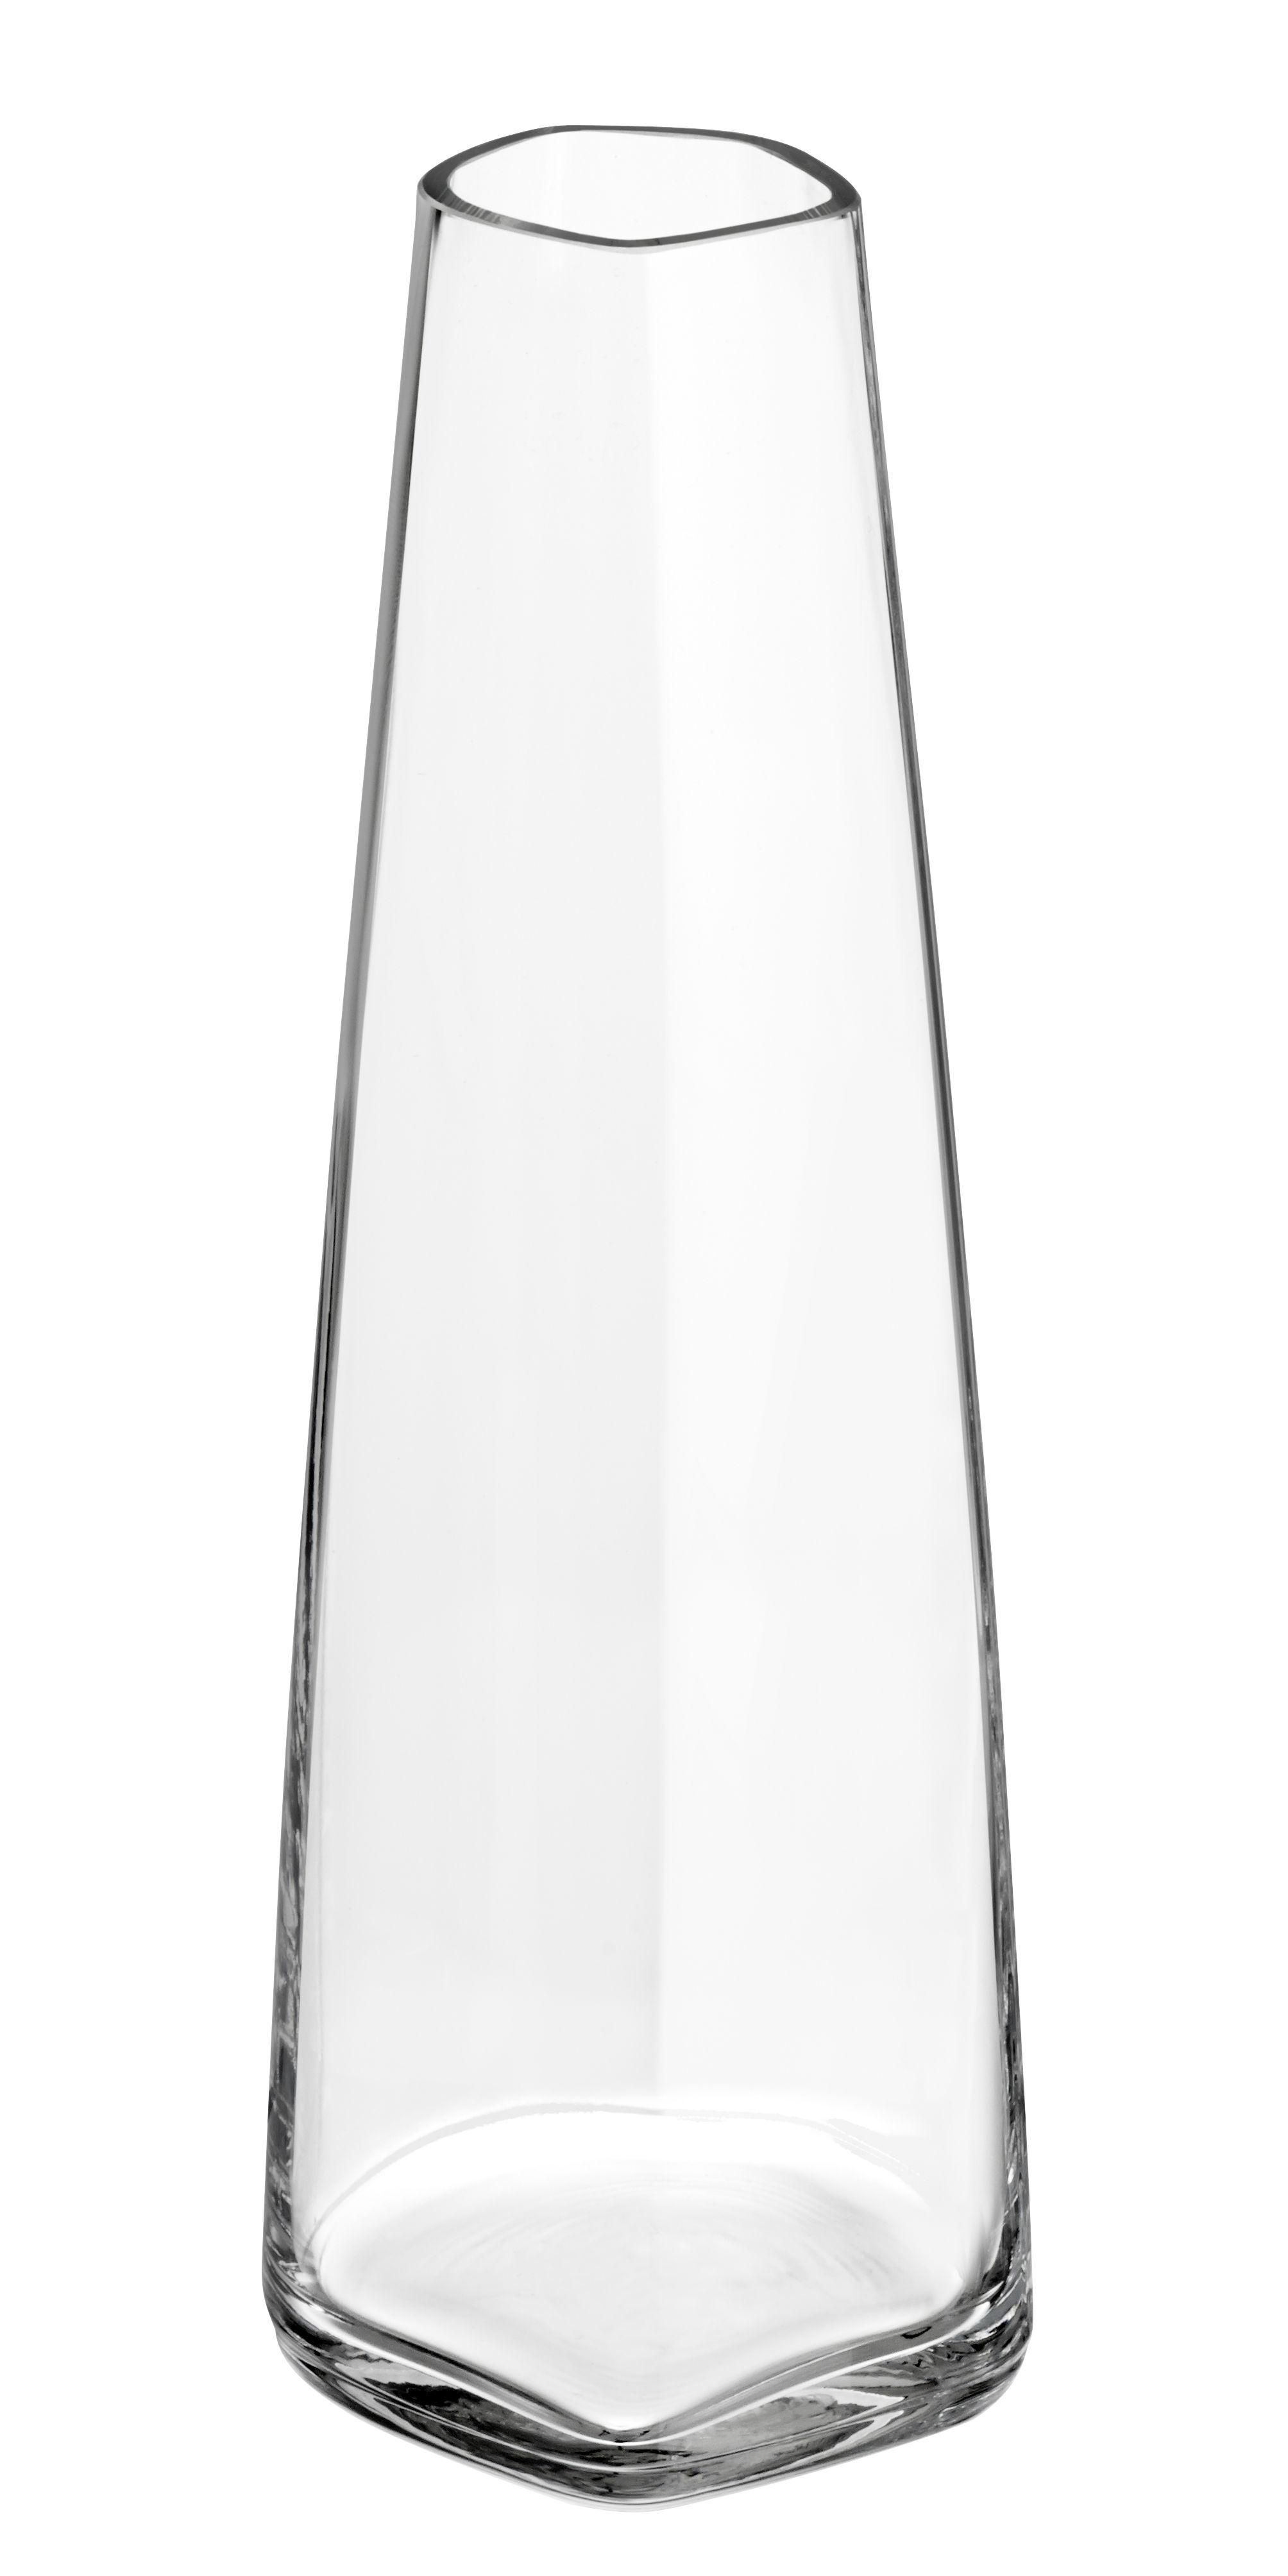 Decoration - Vases - Iittala X Issey Miyake Vase - H 18 cm by Iittala - Transparent - Mouth blown glass